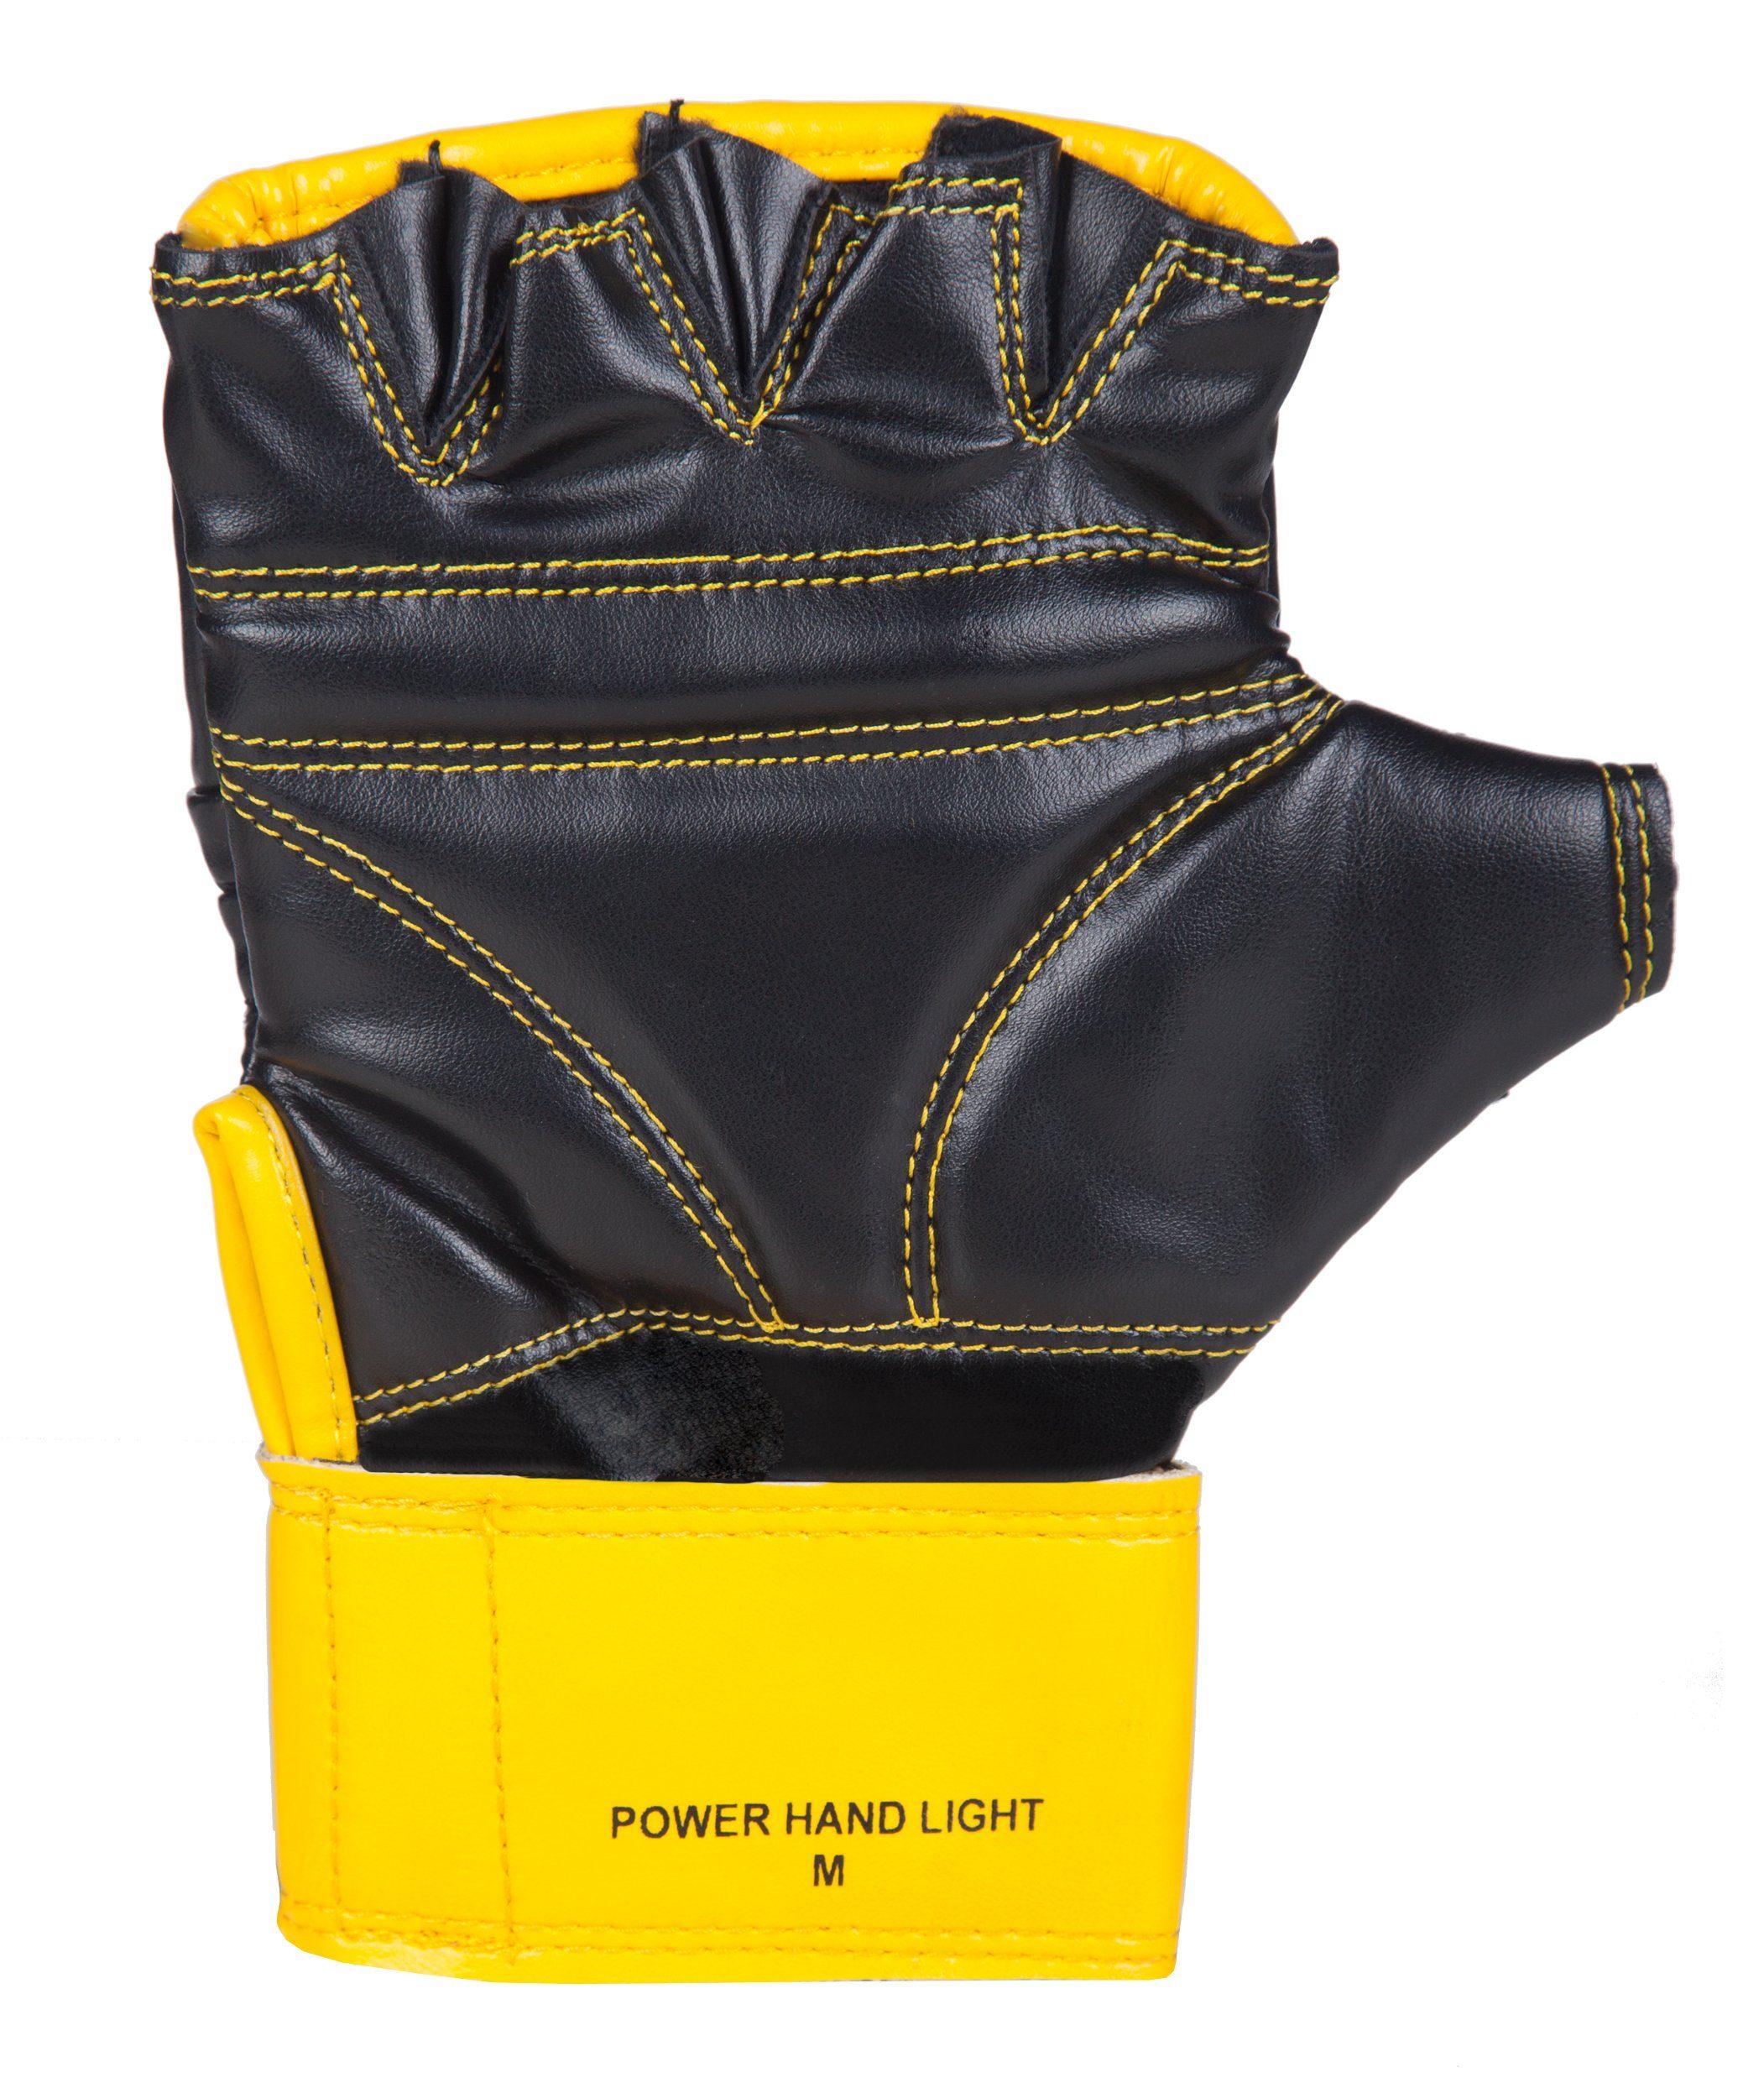 Benlee Rocky Marciano Sandsackhandschuhe mit Fingerführung POWER HAND LIGHT | Accessoires > Handschuhe | Benlee Rocky Marciano